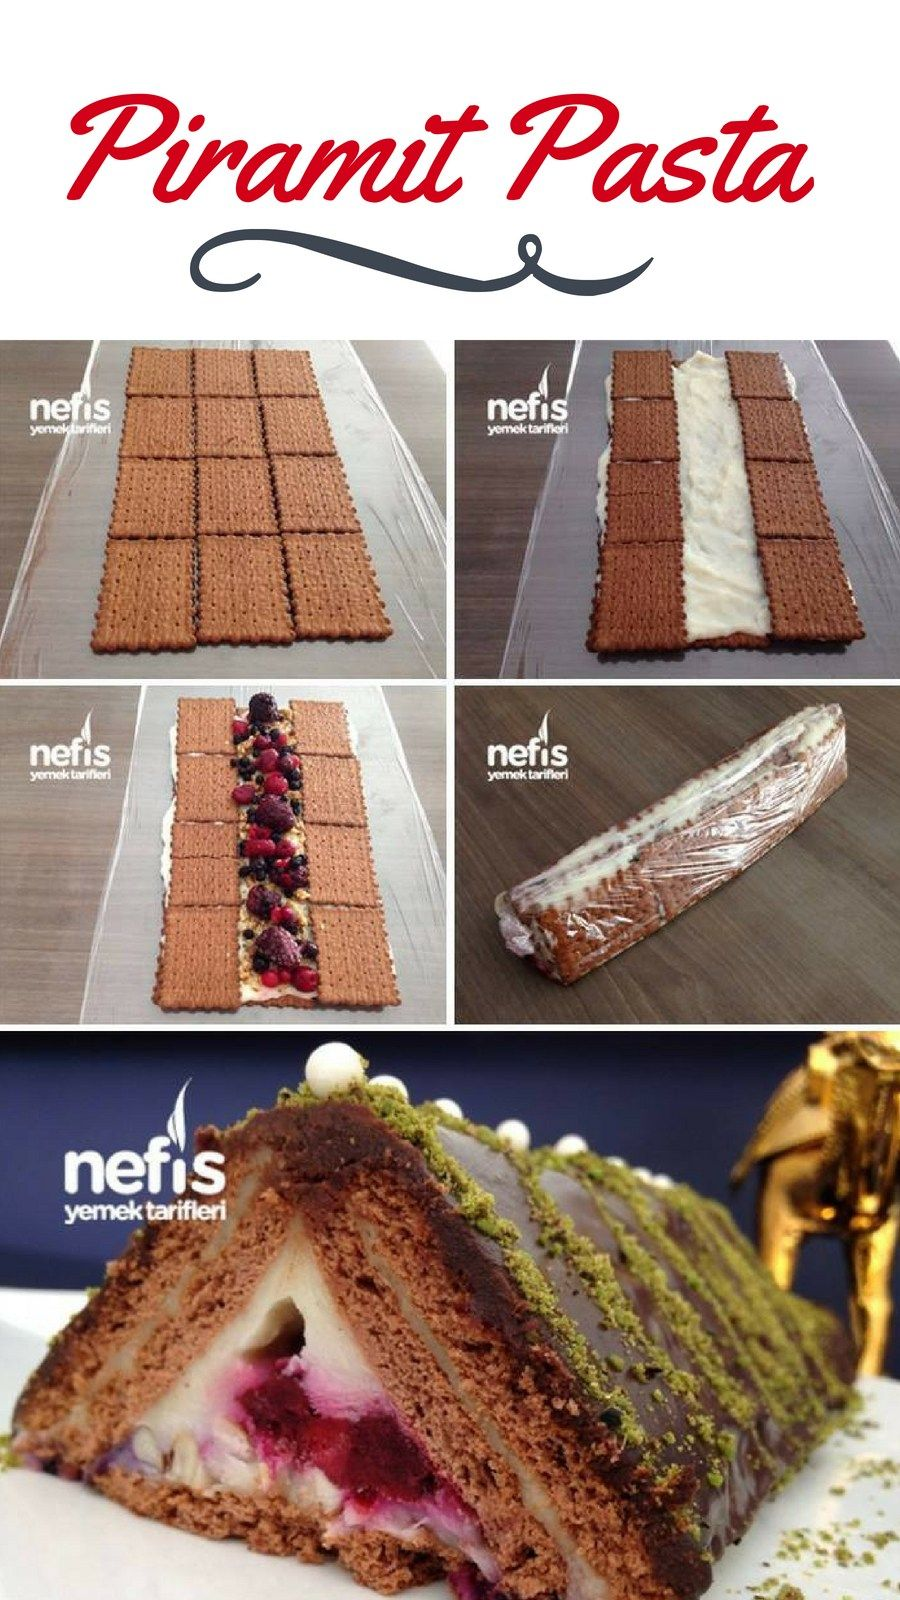 Bisküvili Meyveli Piramit Pasta – Nefis Yemek Tarifleri